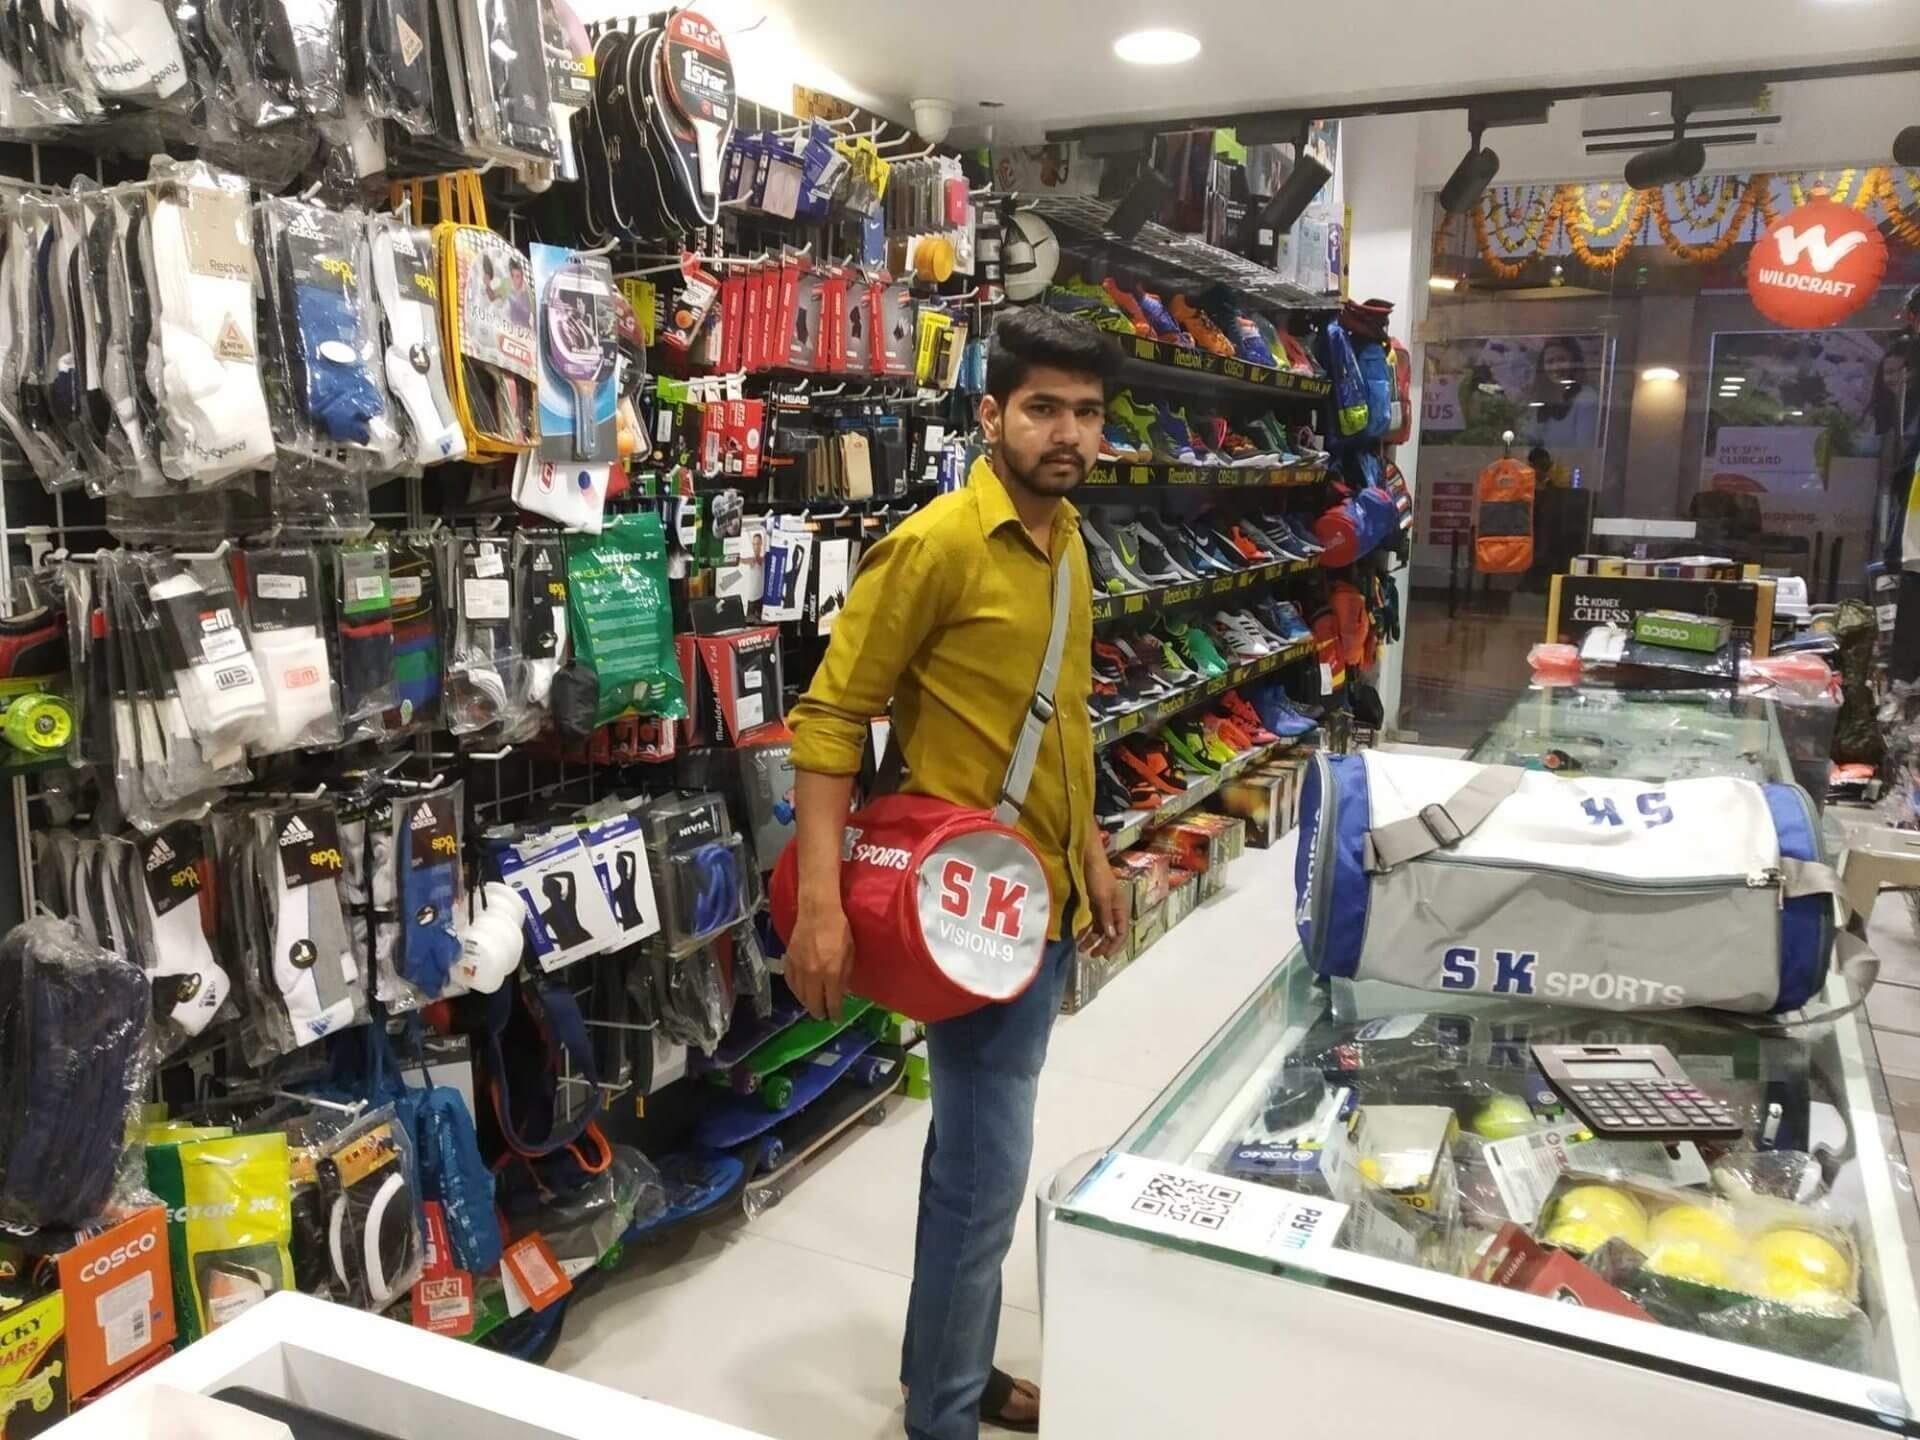 SK-Sports-Goods-Store-shop-interior Sports Goods Store / Shop in Pimple Saudagar – SK Sports and Sales | sports goods store / shop in pimple saudagar